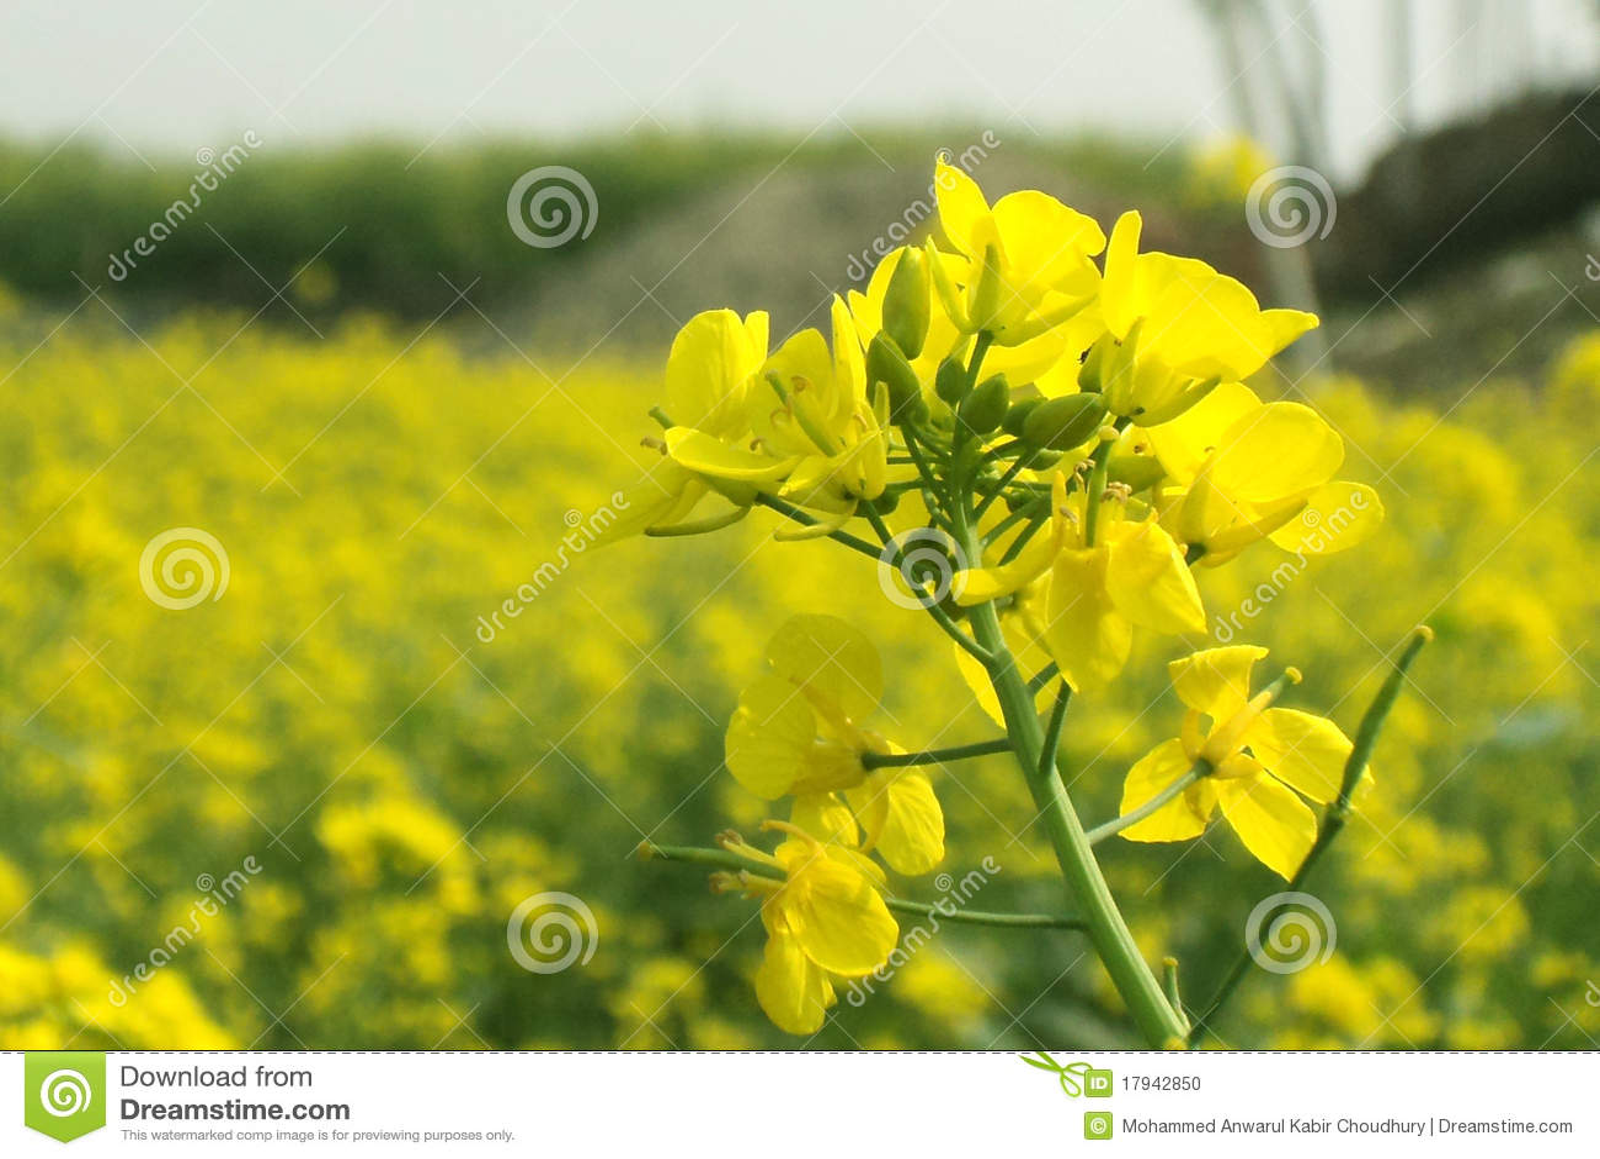 fleur de moutarde photo stock image du macro clear 17942850. Black Bedroom Furniture Sets. Home Design Ideas